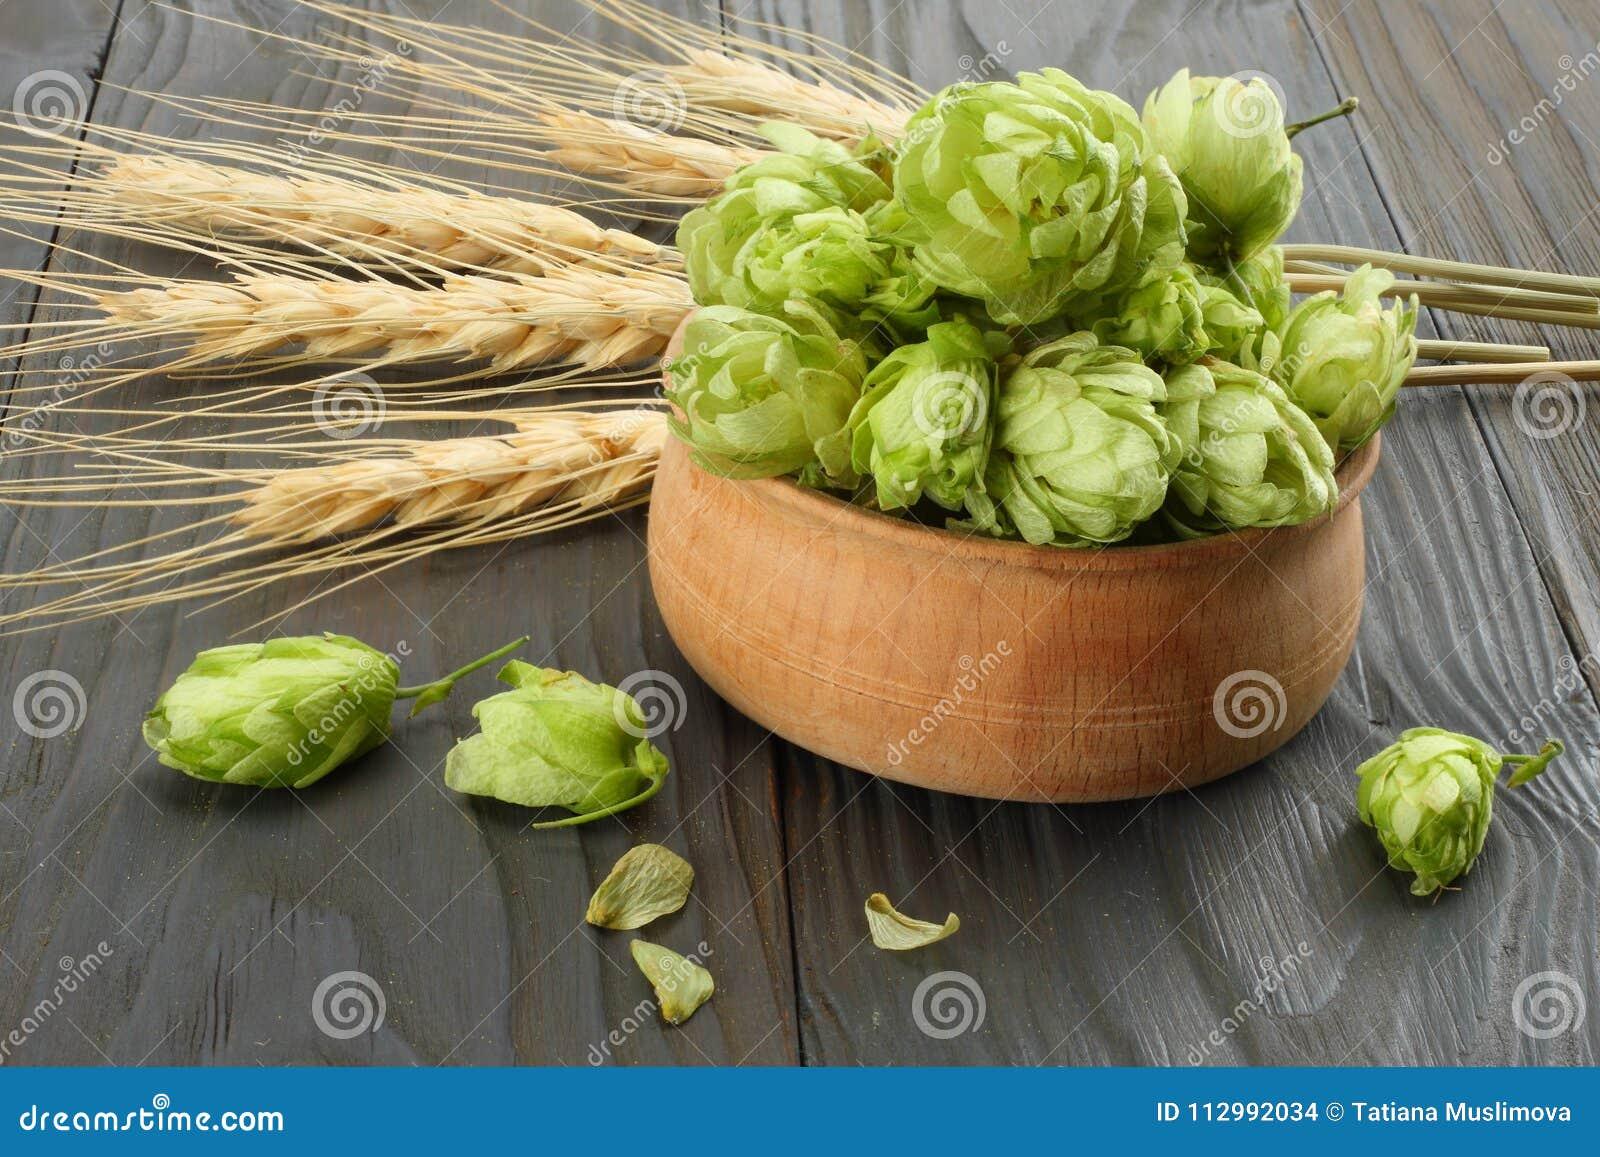 Beer brewing ingredients Hop cones and wheat ears on dark wooden table. Beer brewery concept. Beer background